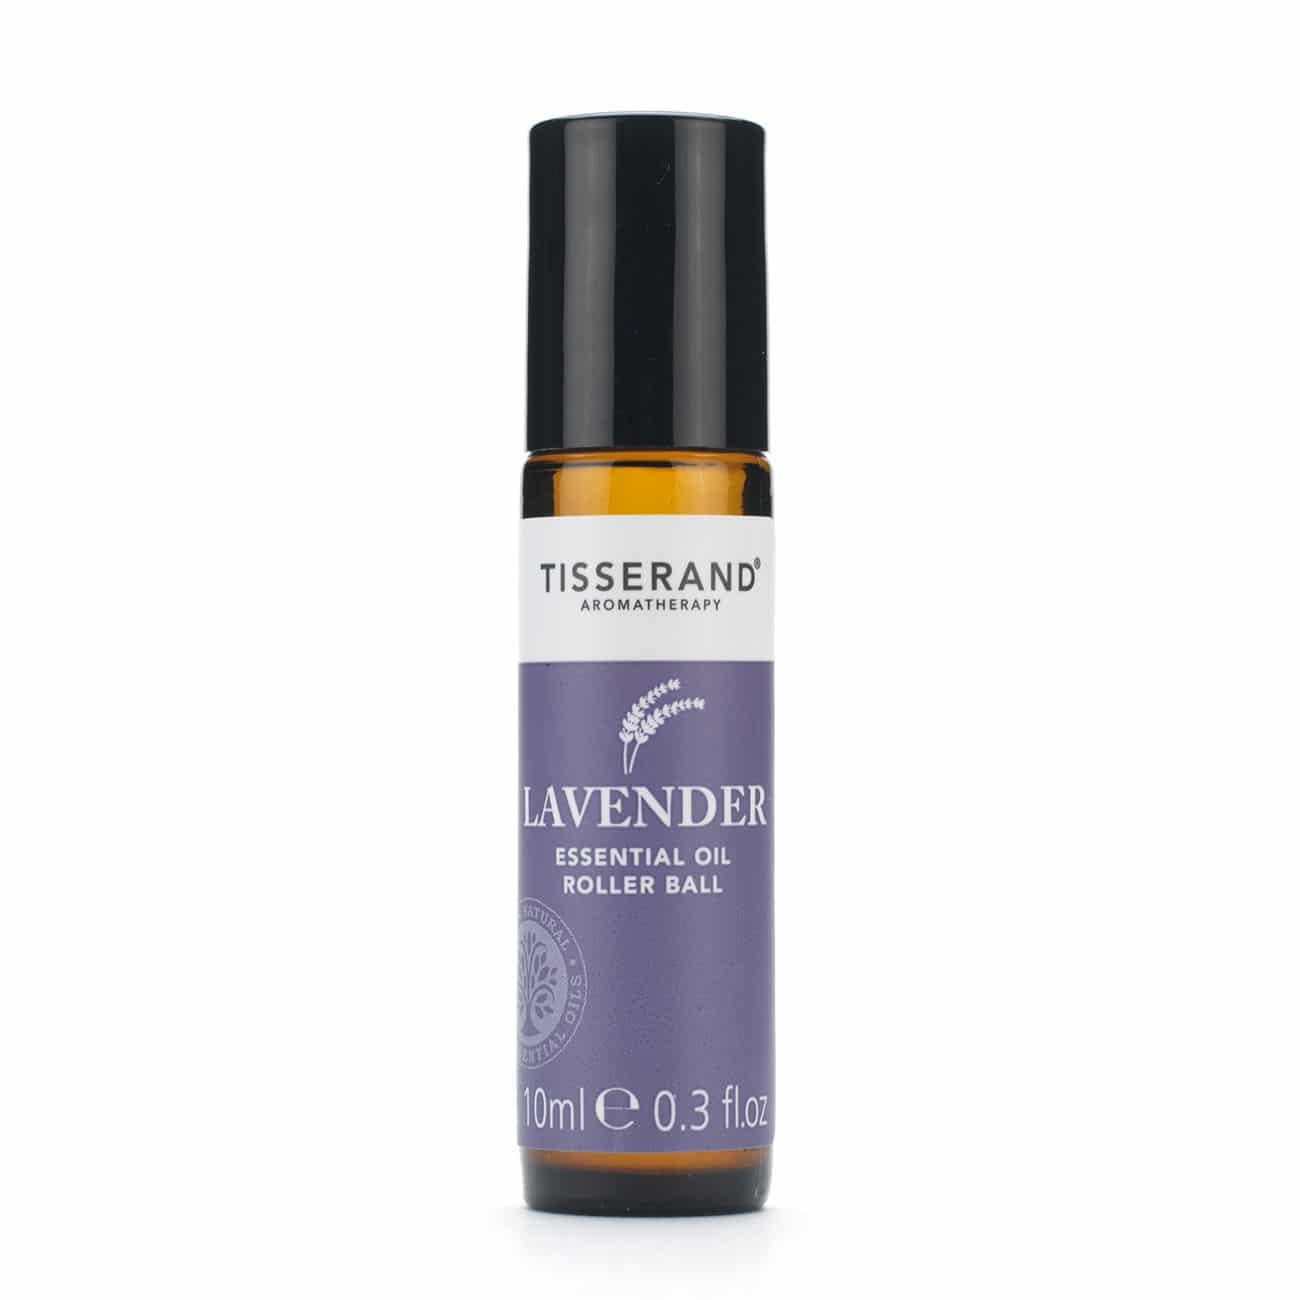 Tisserand-Aromatherapy-Lavender-Roller-Ball